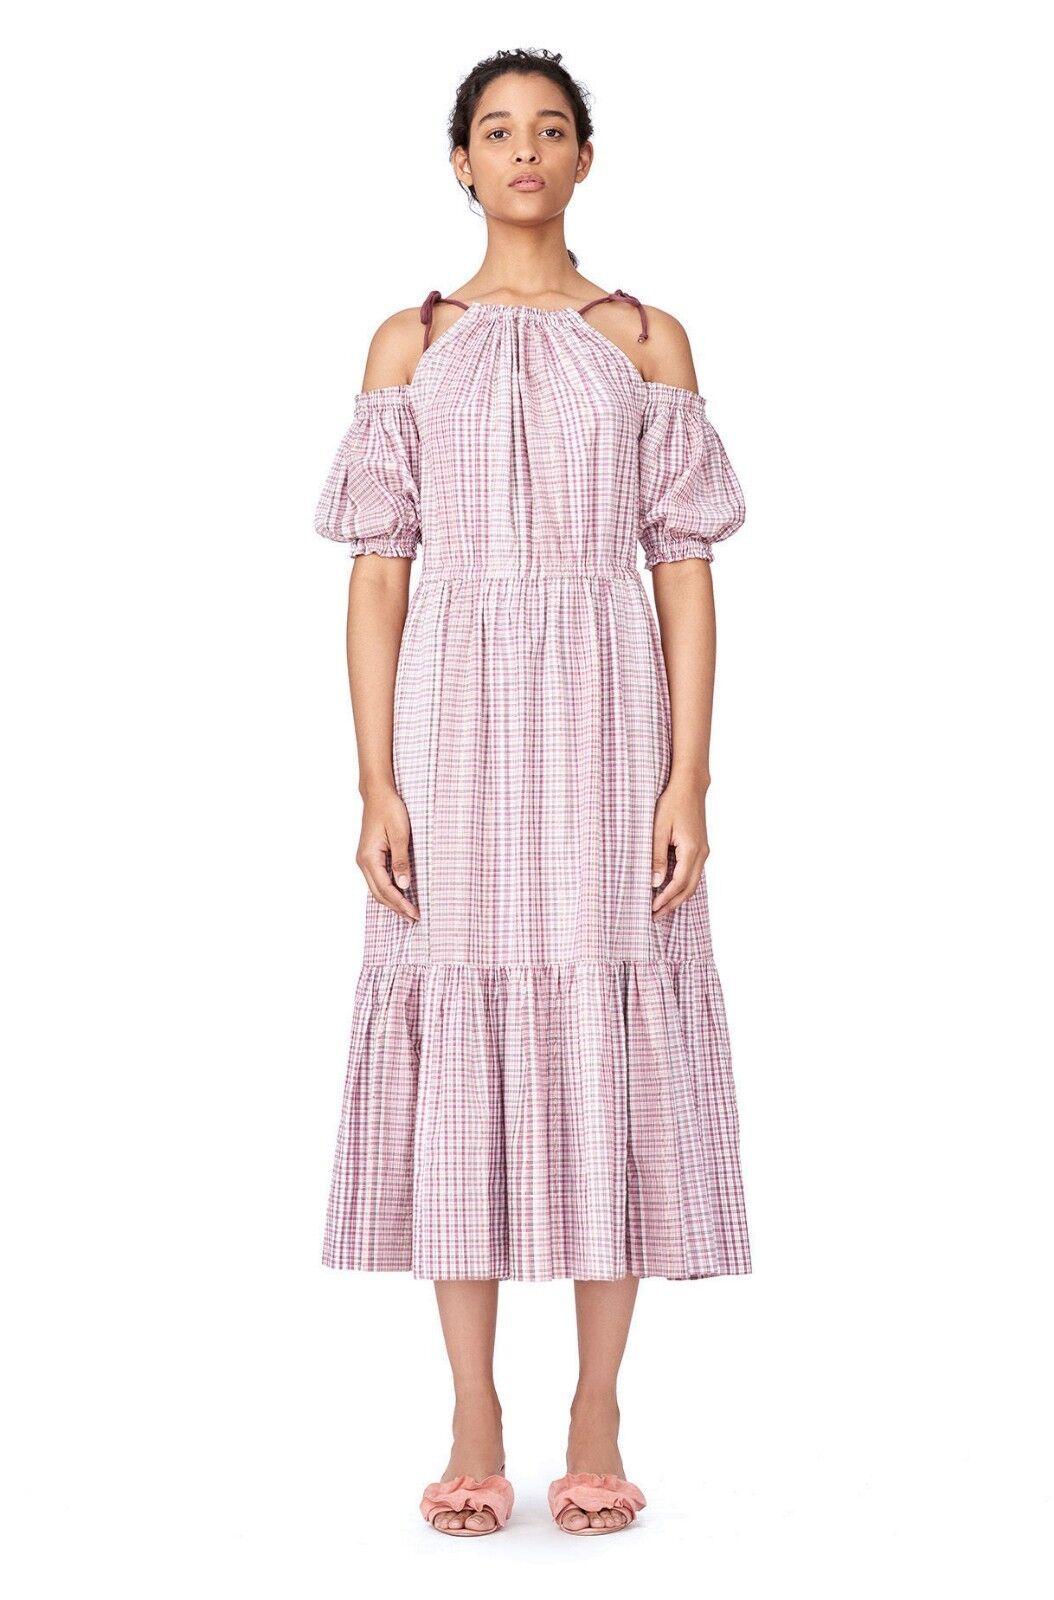 La Vie REBECCA TAYLOR Pink Lurex Metallic Metallic Metallic Plaid Cold Shoulder Midi Dress S 4 6 215832